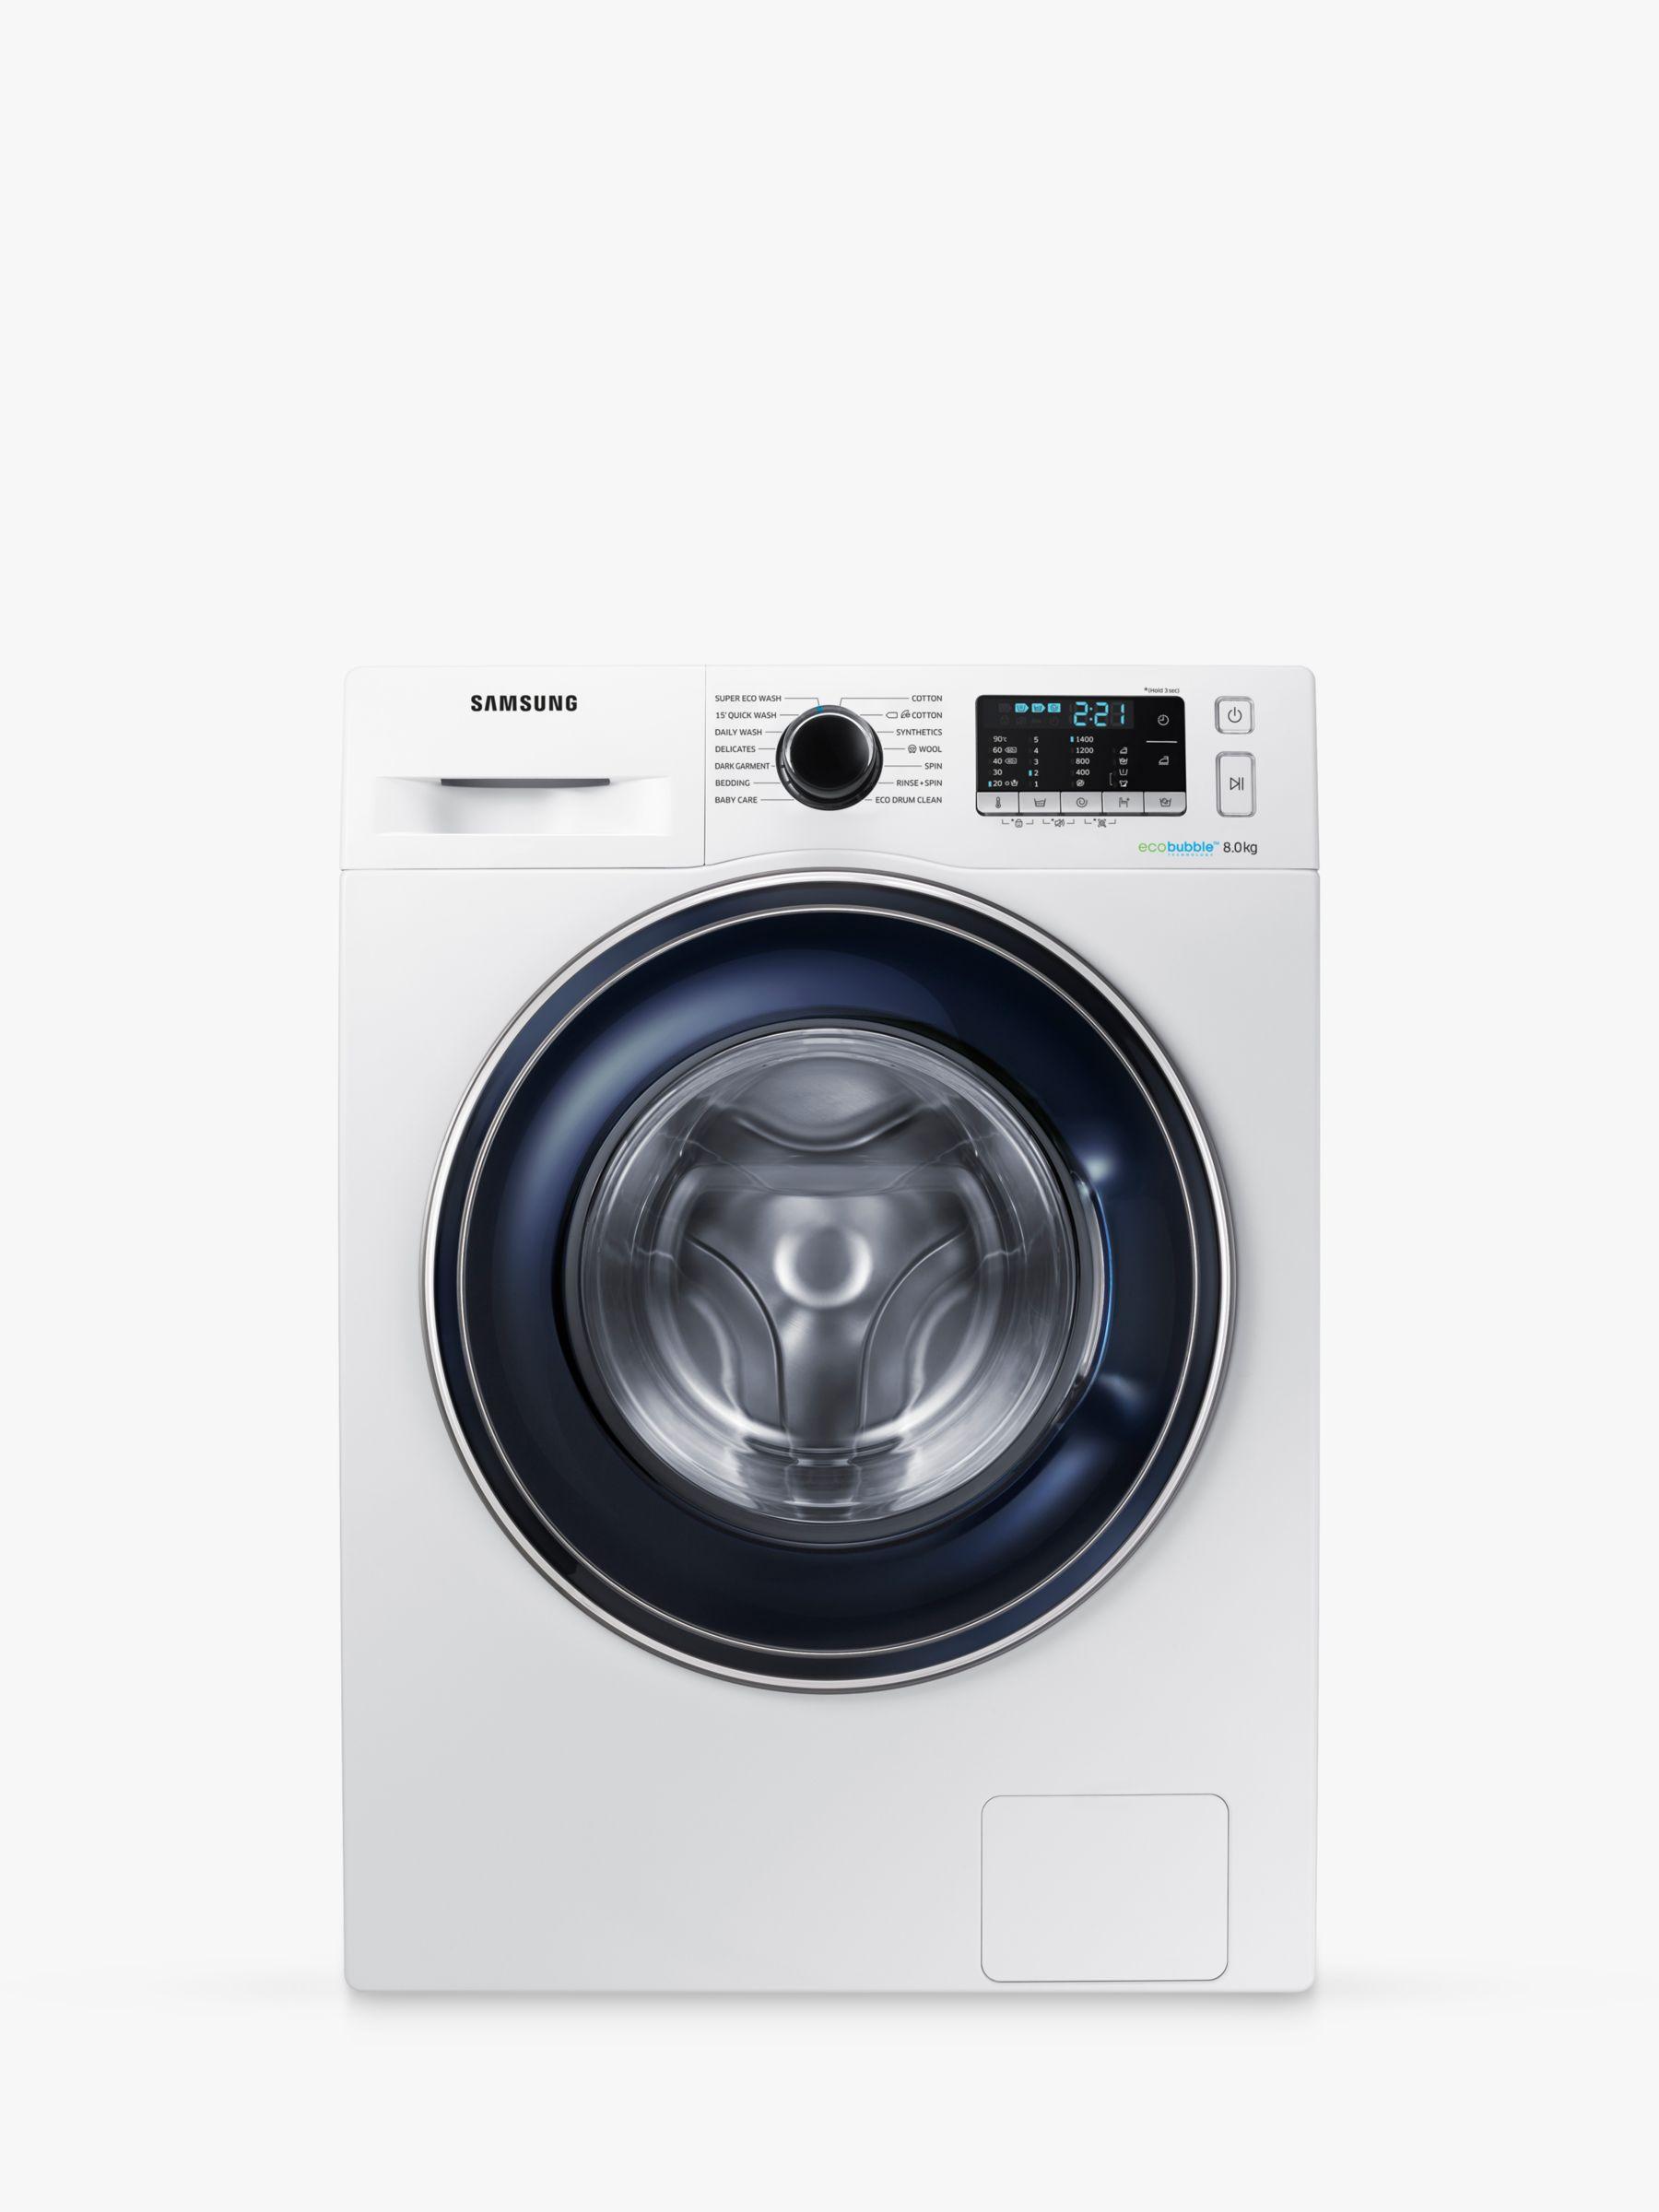 Samsung Samsung WW80J5555FW/EU ecobubble Freestanding Washing Machine, 8kg Load, A+++ Energy Rating, 1400rpm Spin, White